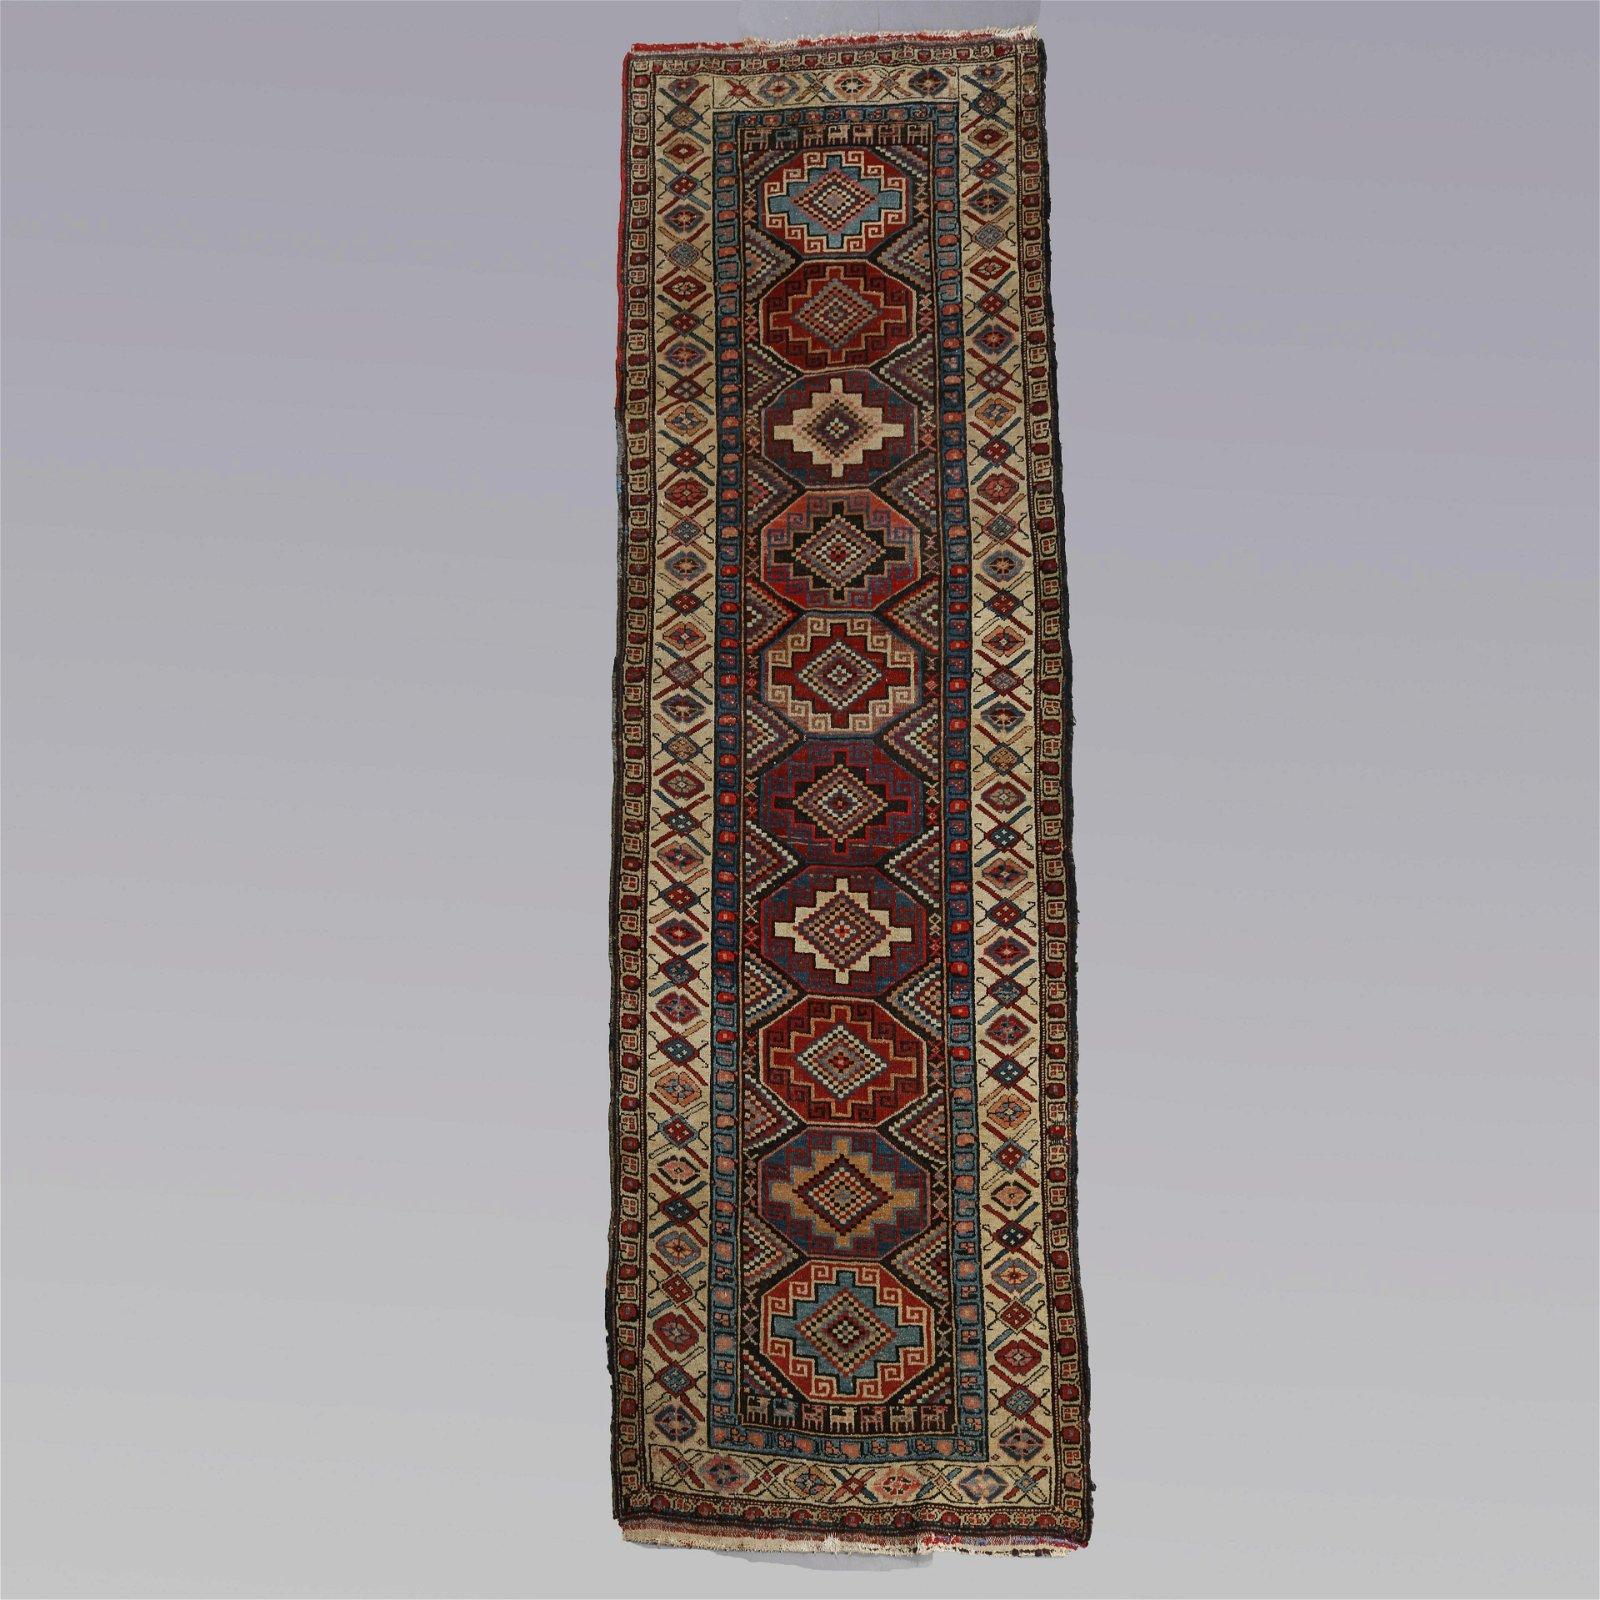 Antique Hand Knotted Caucasian Kazak Tribal Long Rug